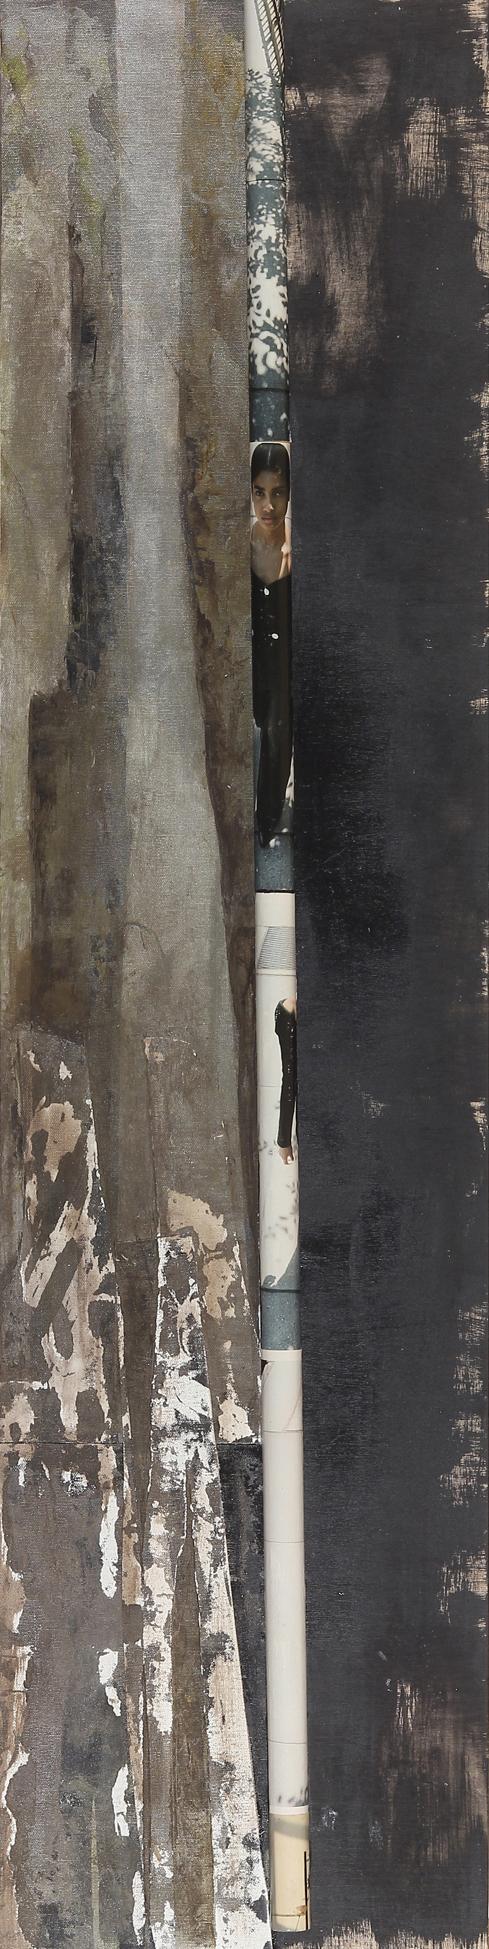 Trees Paper Styx 2